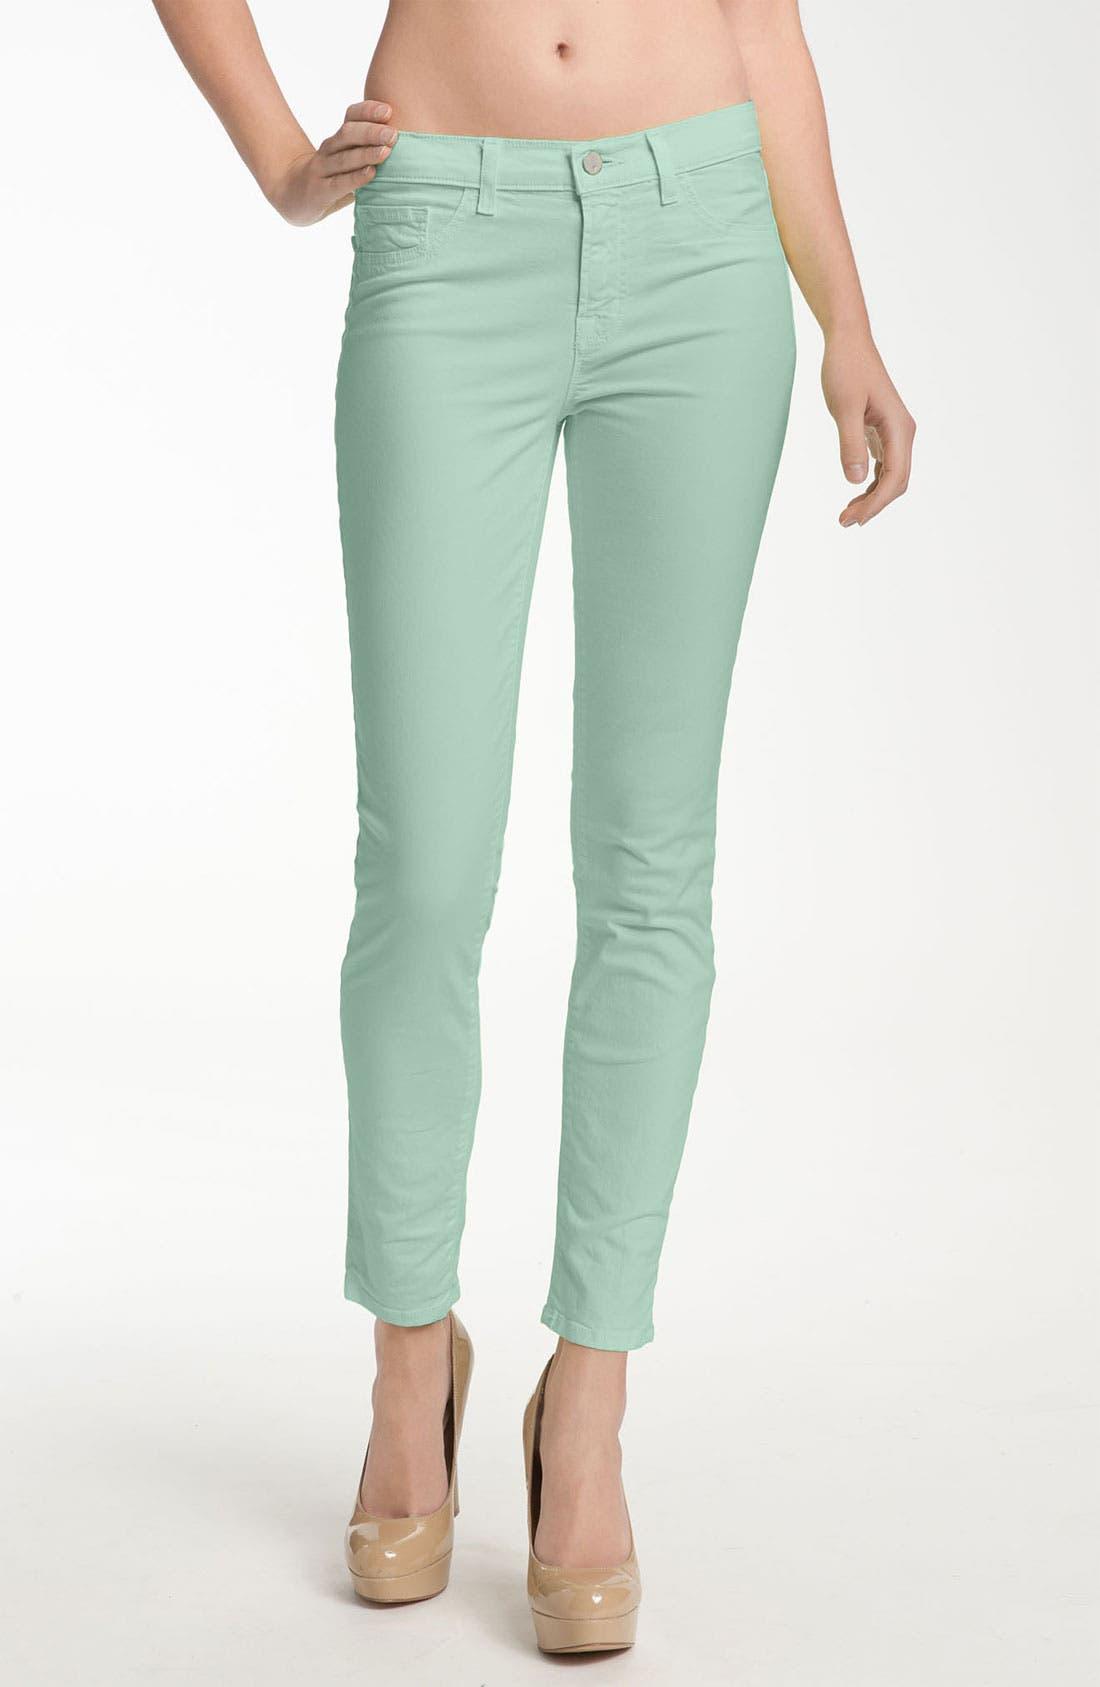 Alternate Image 1 Selected - J Brand Skinny Stretch Twill Pants